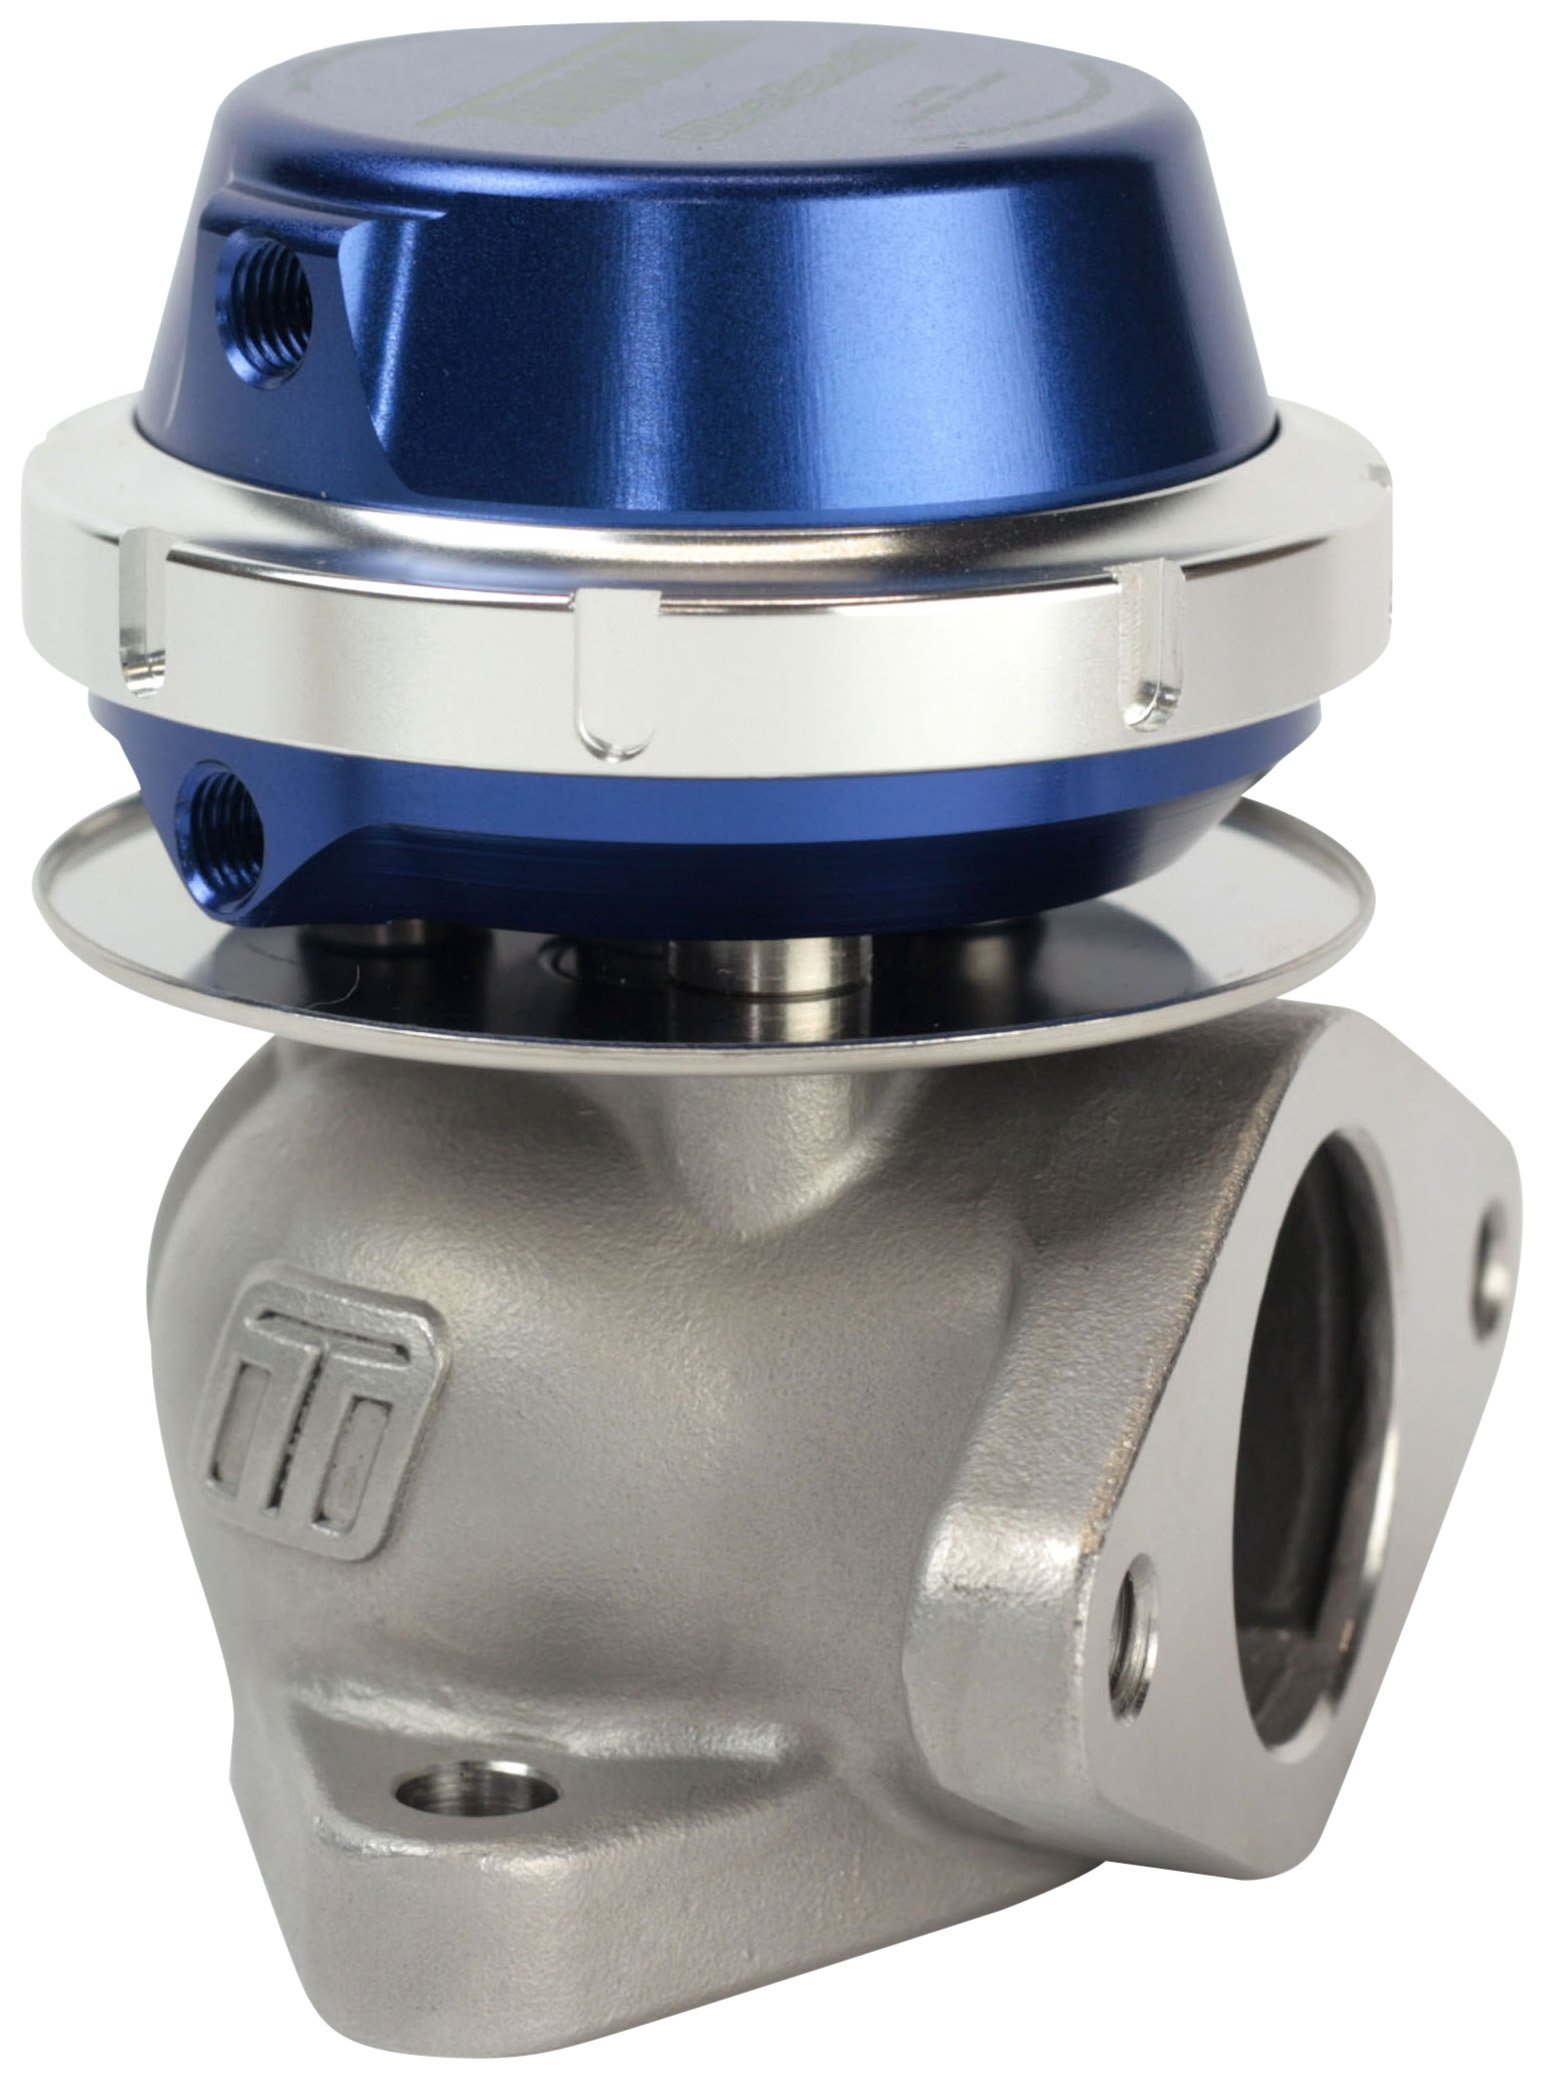 Turbosmart TS-0501-1140 Blue WG38 2011 Ultra-Gate38 14 PSI Wastegate